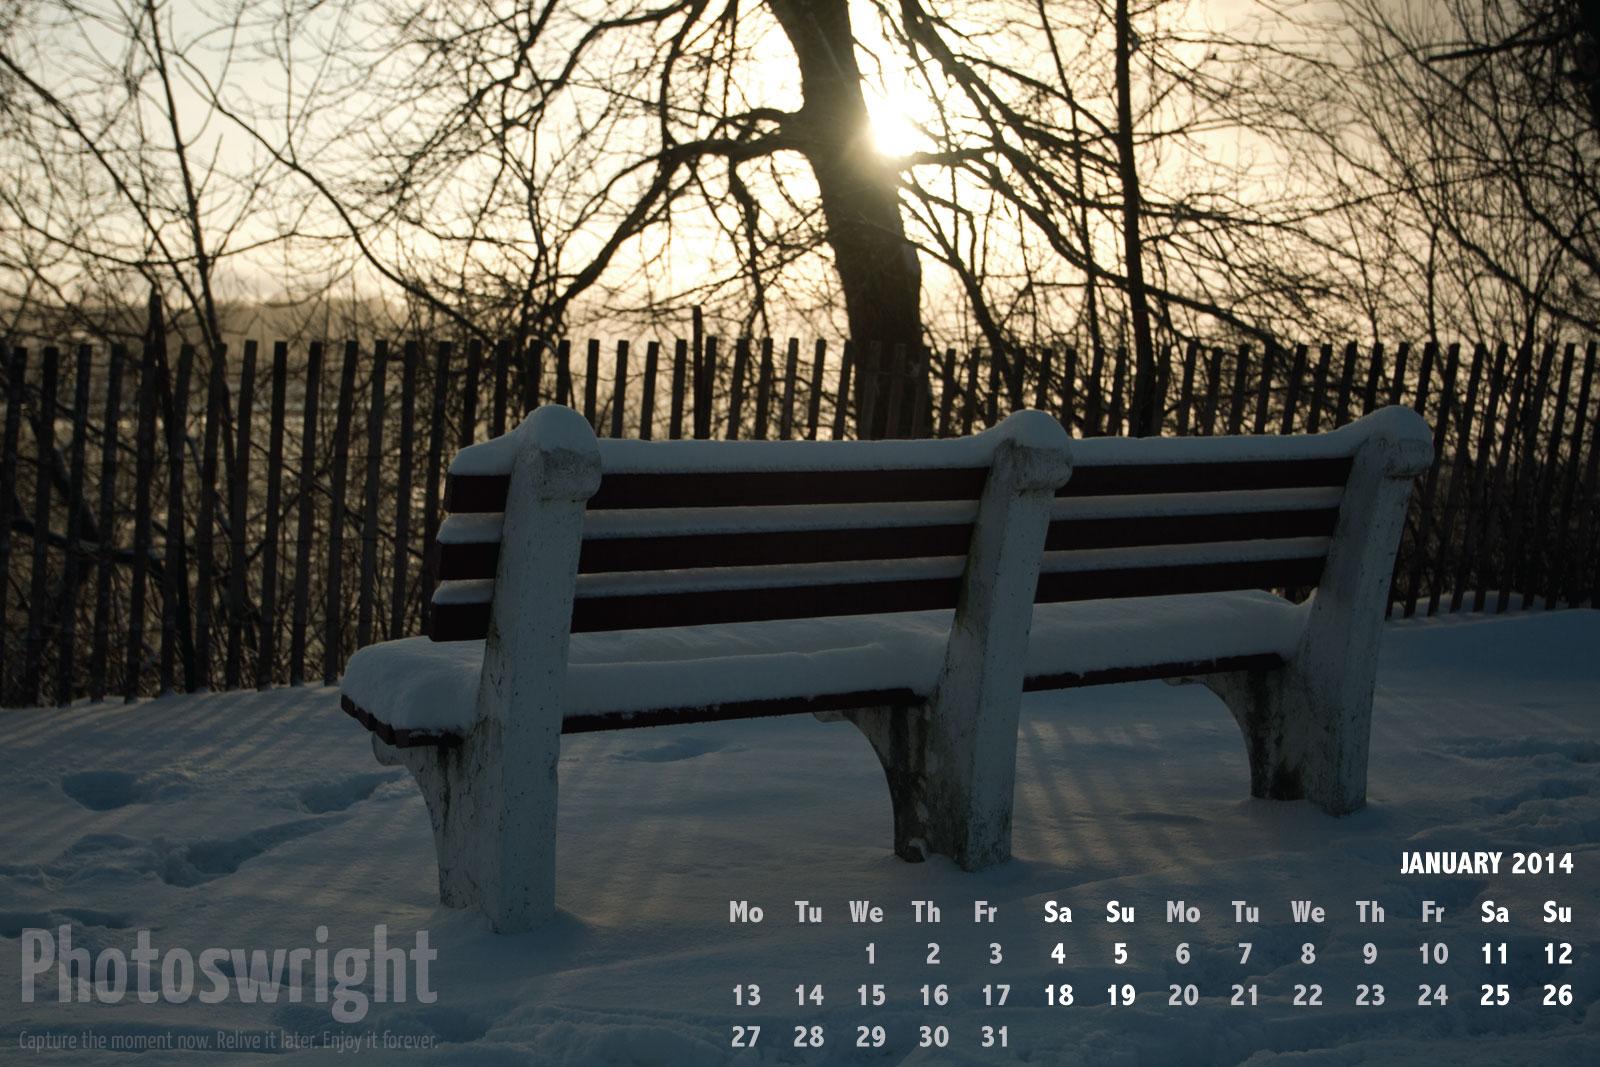 Web calendar: January 2014